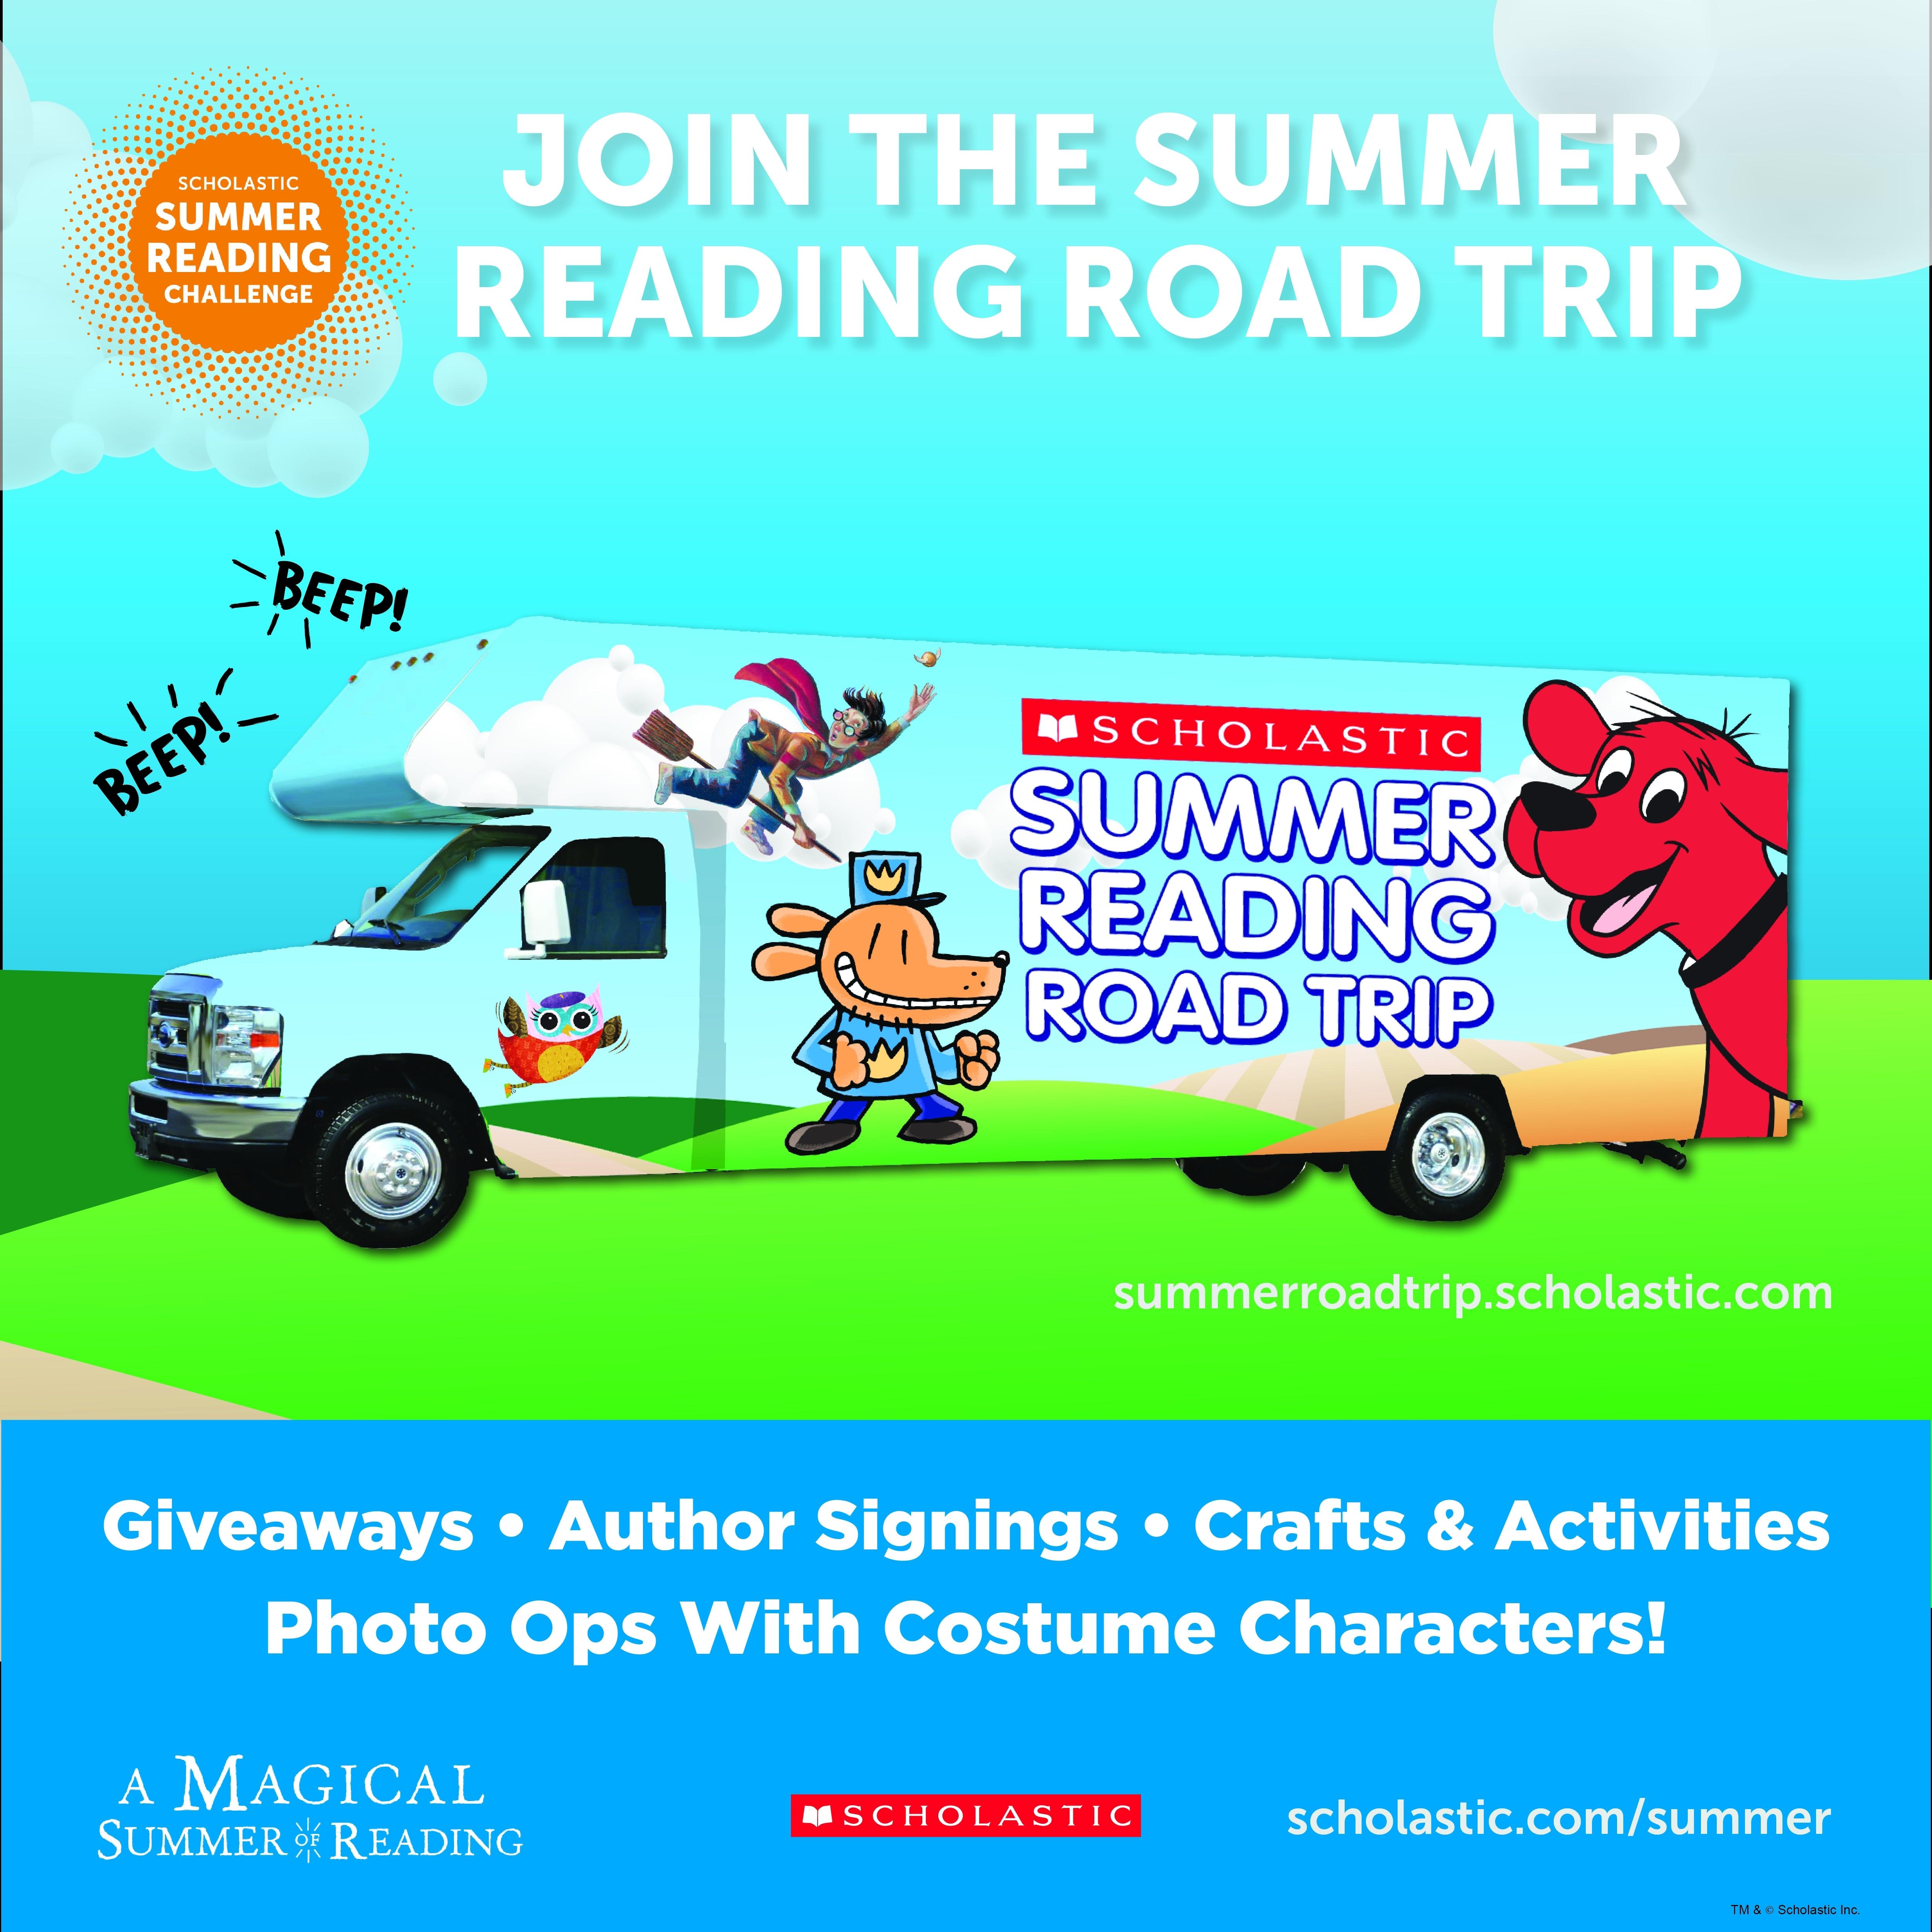 Scholastic Summer Reading Road Trip